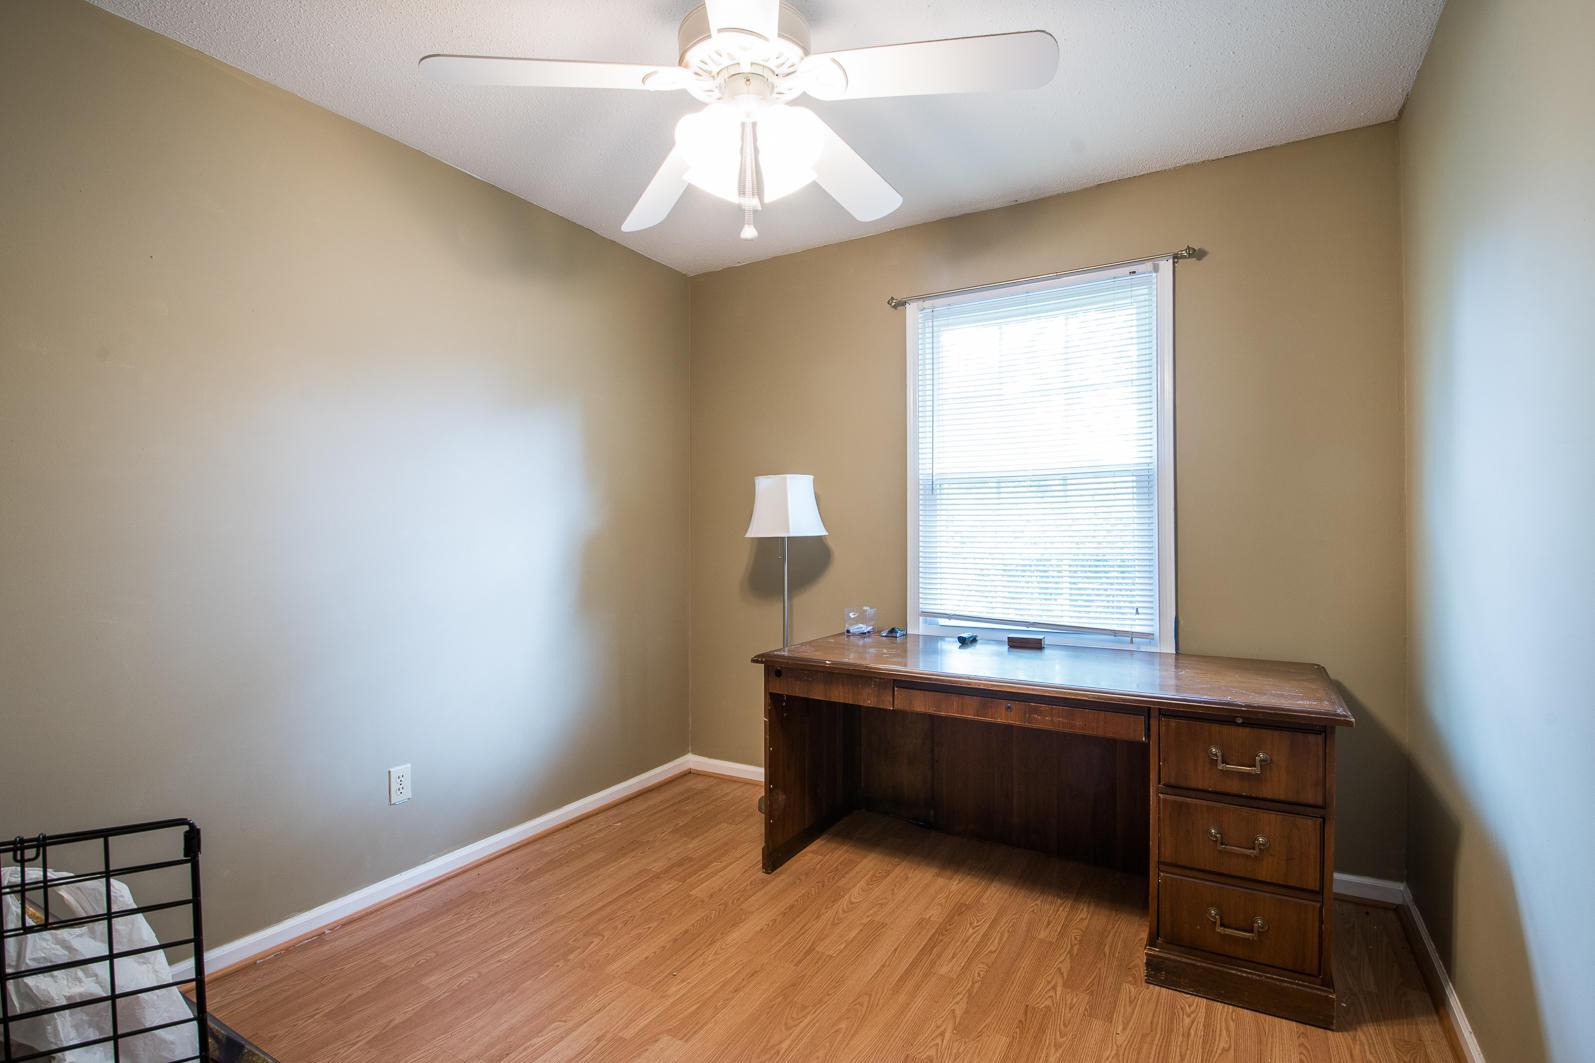 Wando East Homes For Sale - 1605 Babington, Mount Pleasant, SC - 11